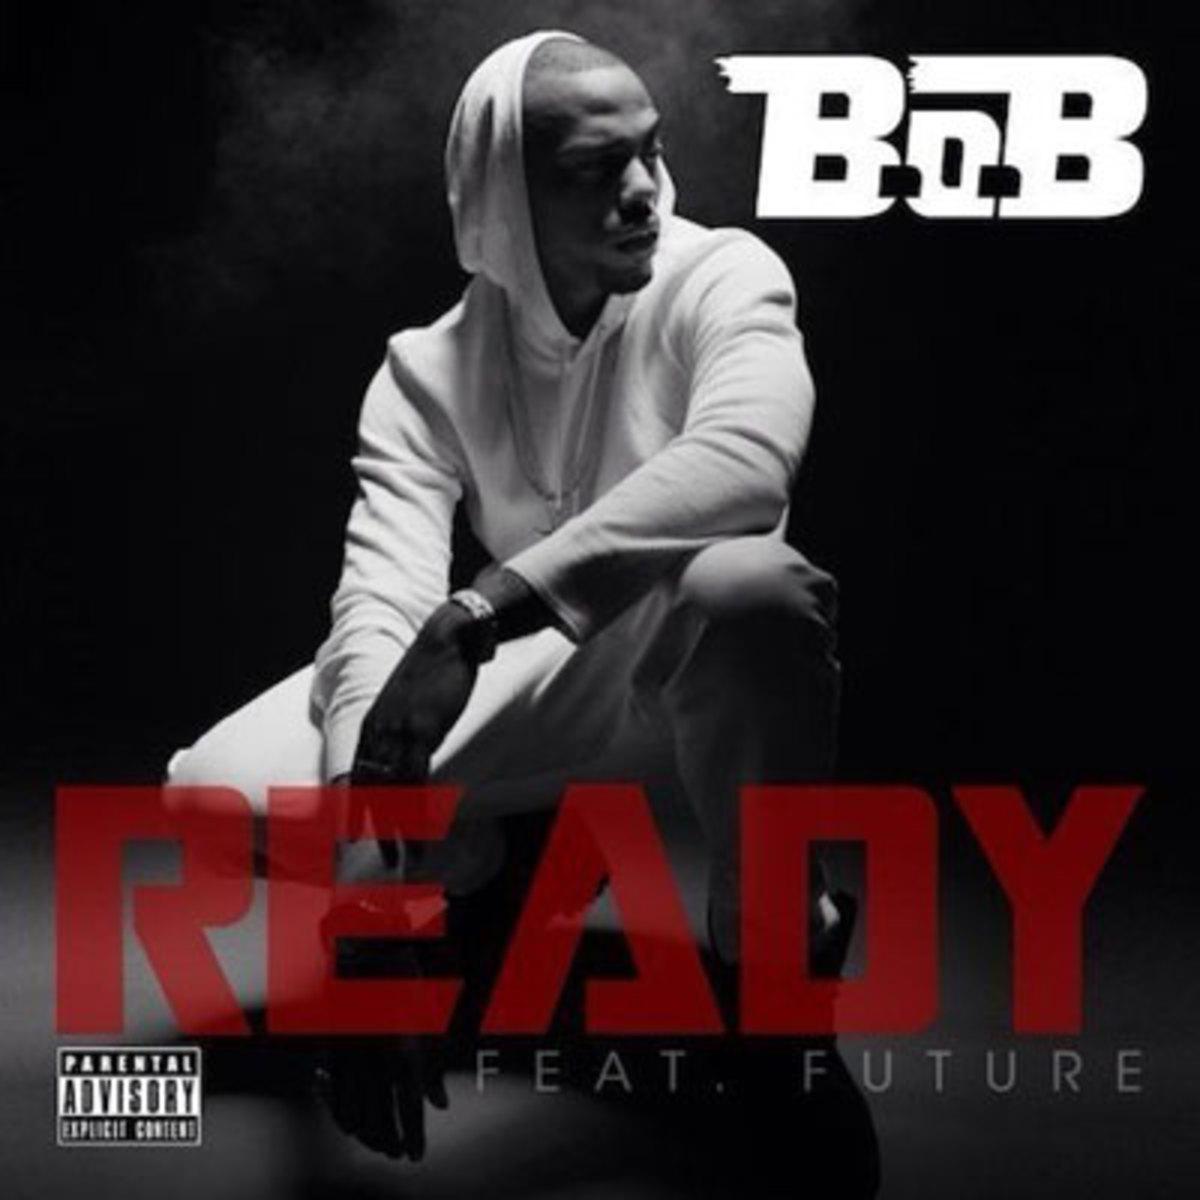 bob-ready.jpg